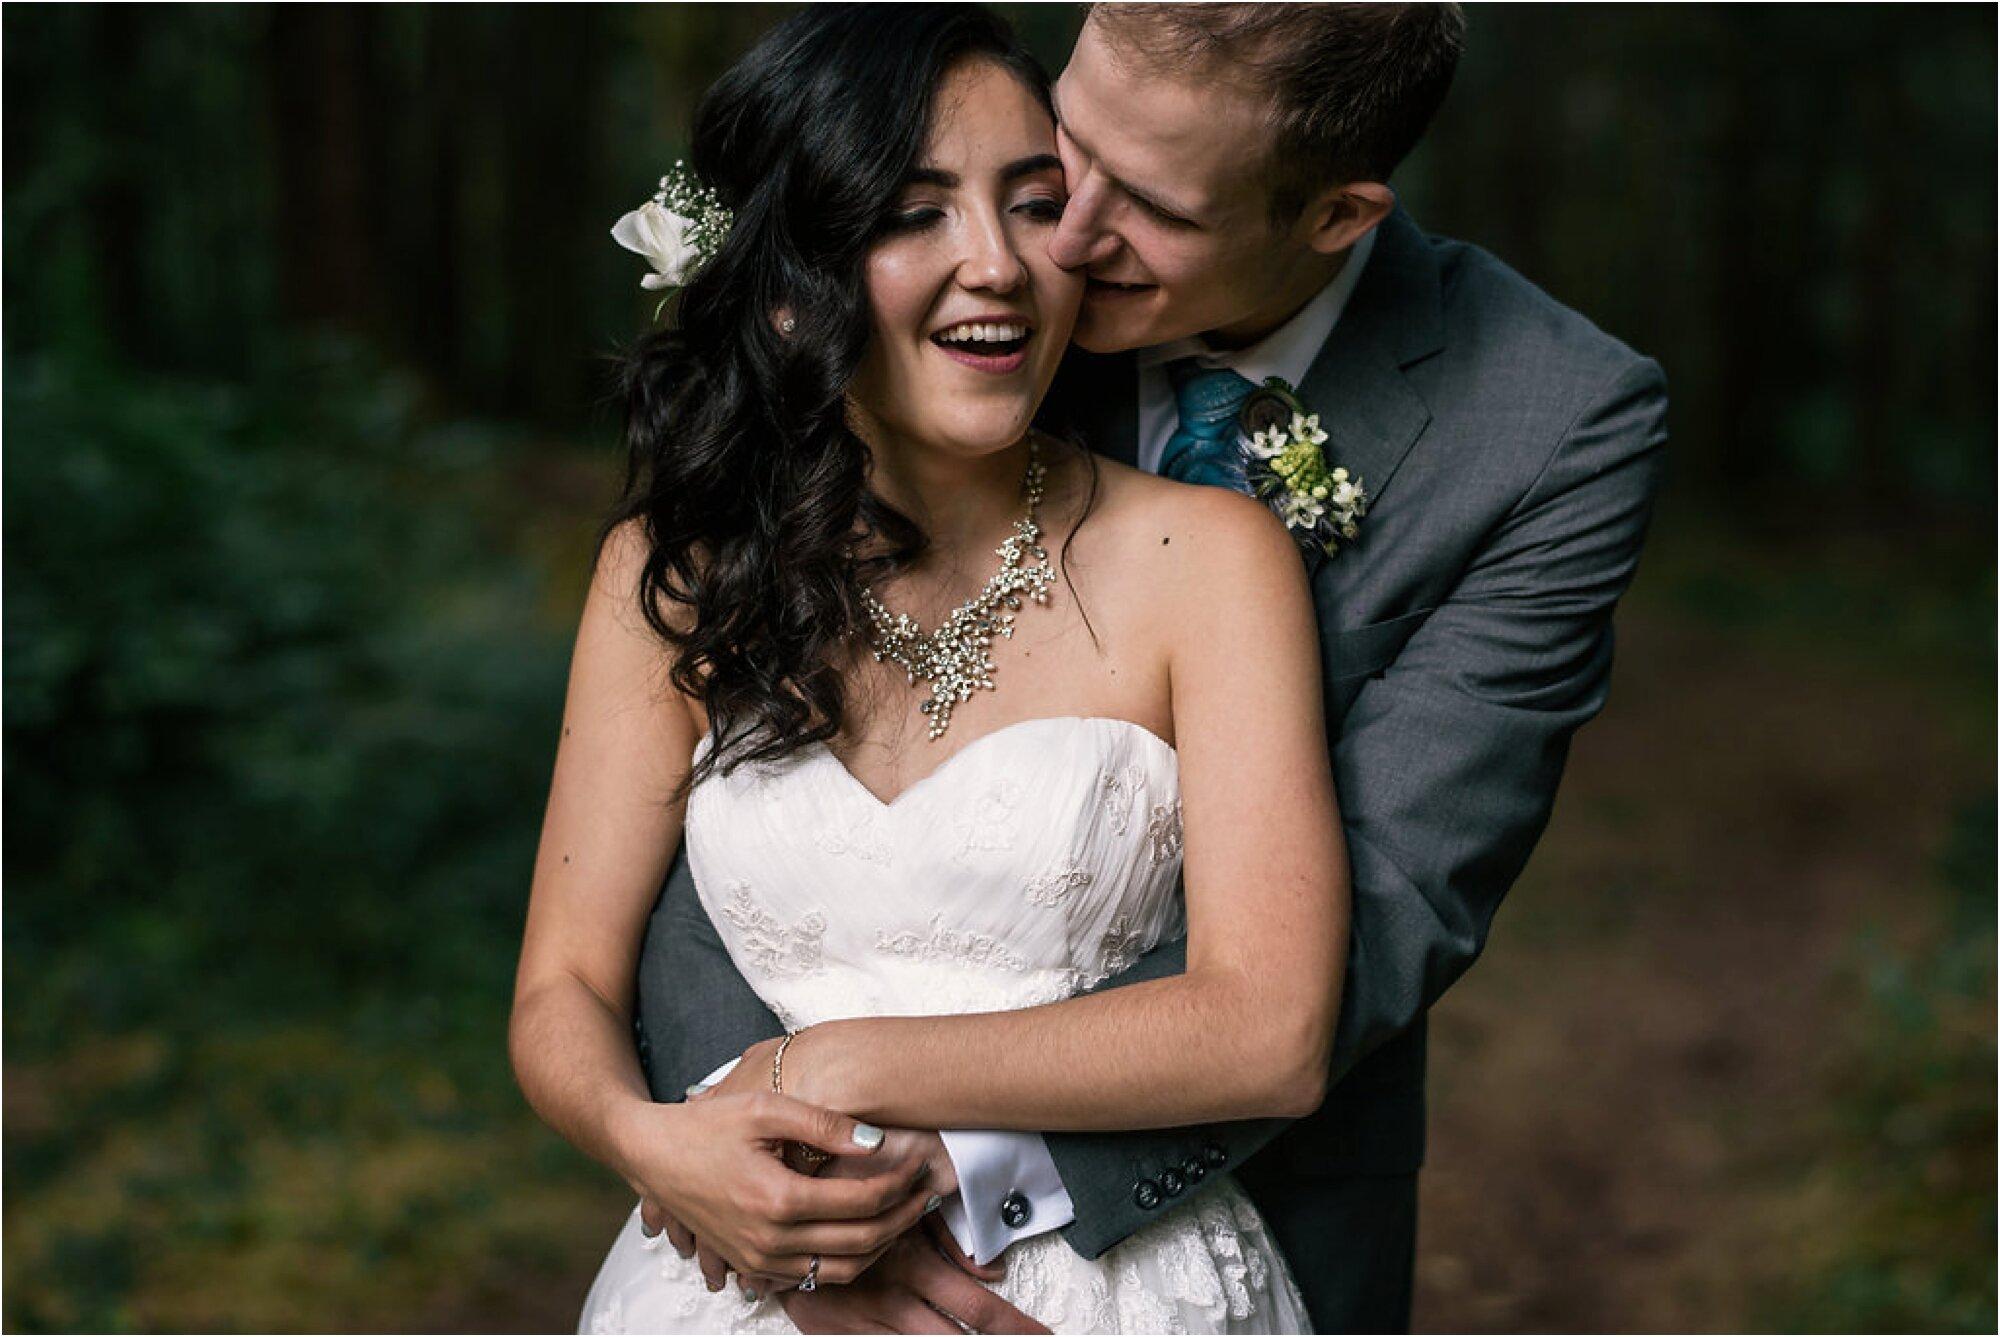 Newlyweds embrace after wedding ceremony at campsite in Northwest Washington state